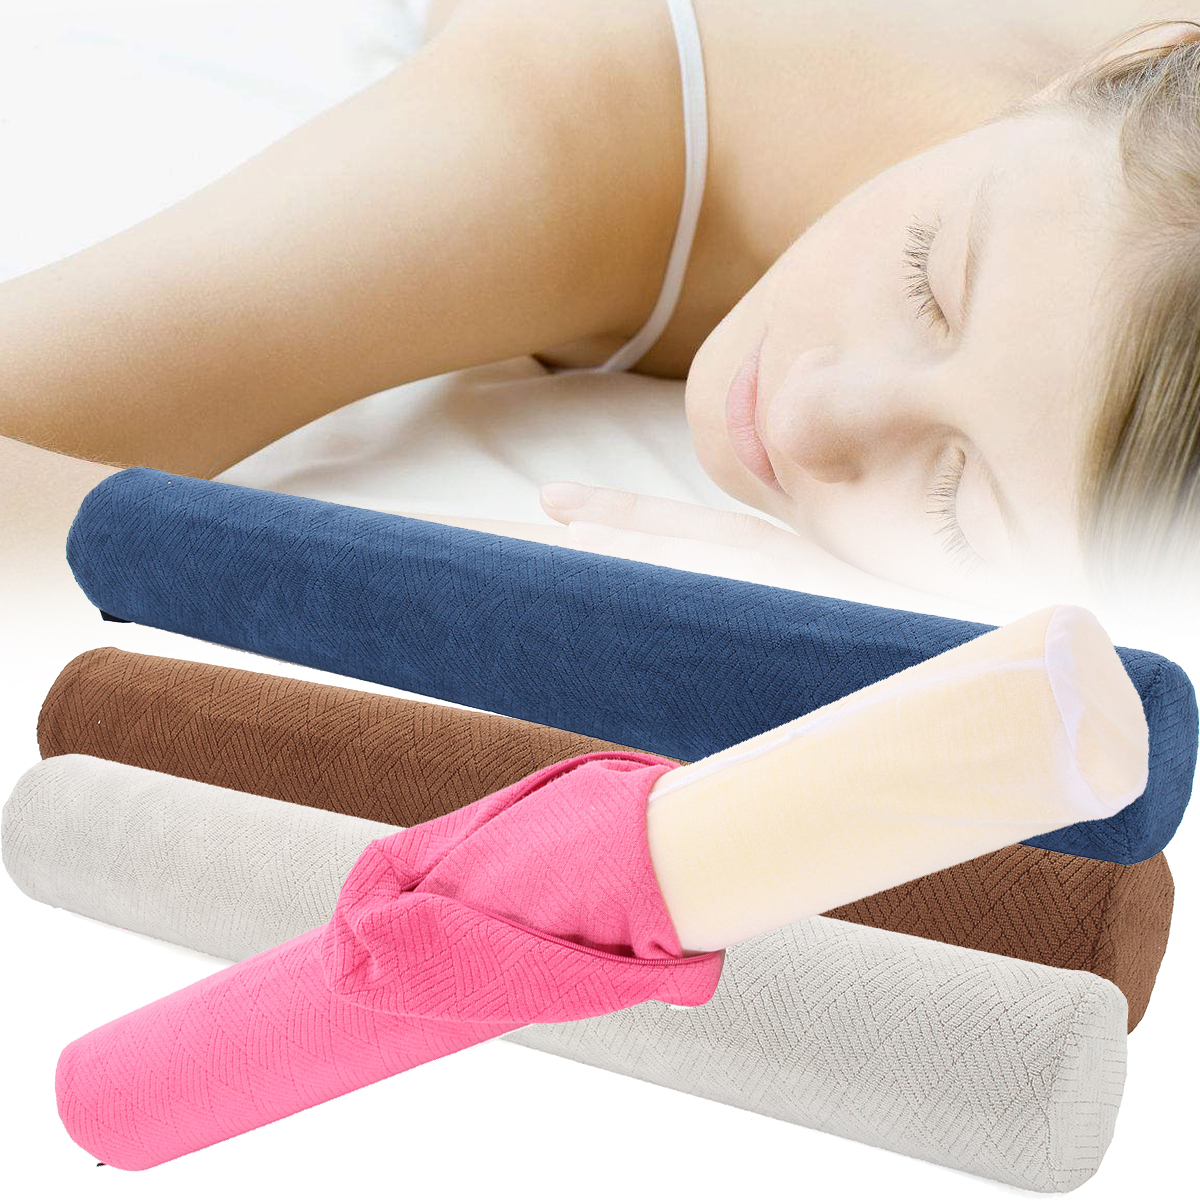 23 x4 washable round cervical pillow